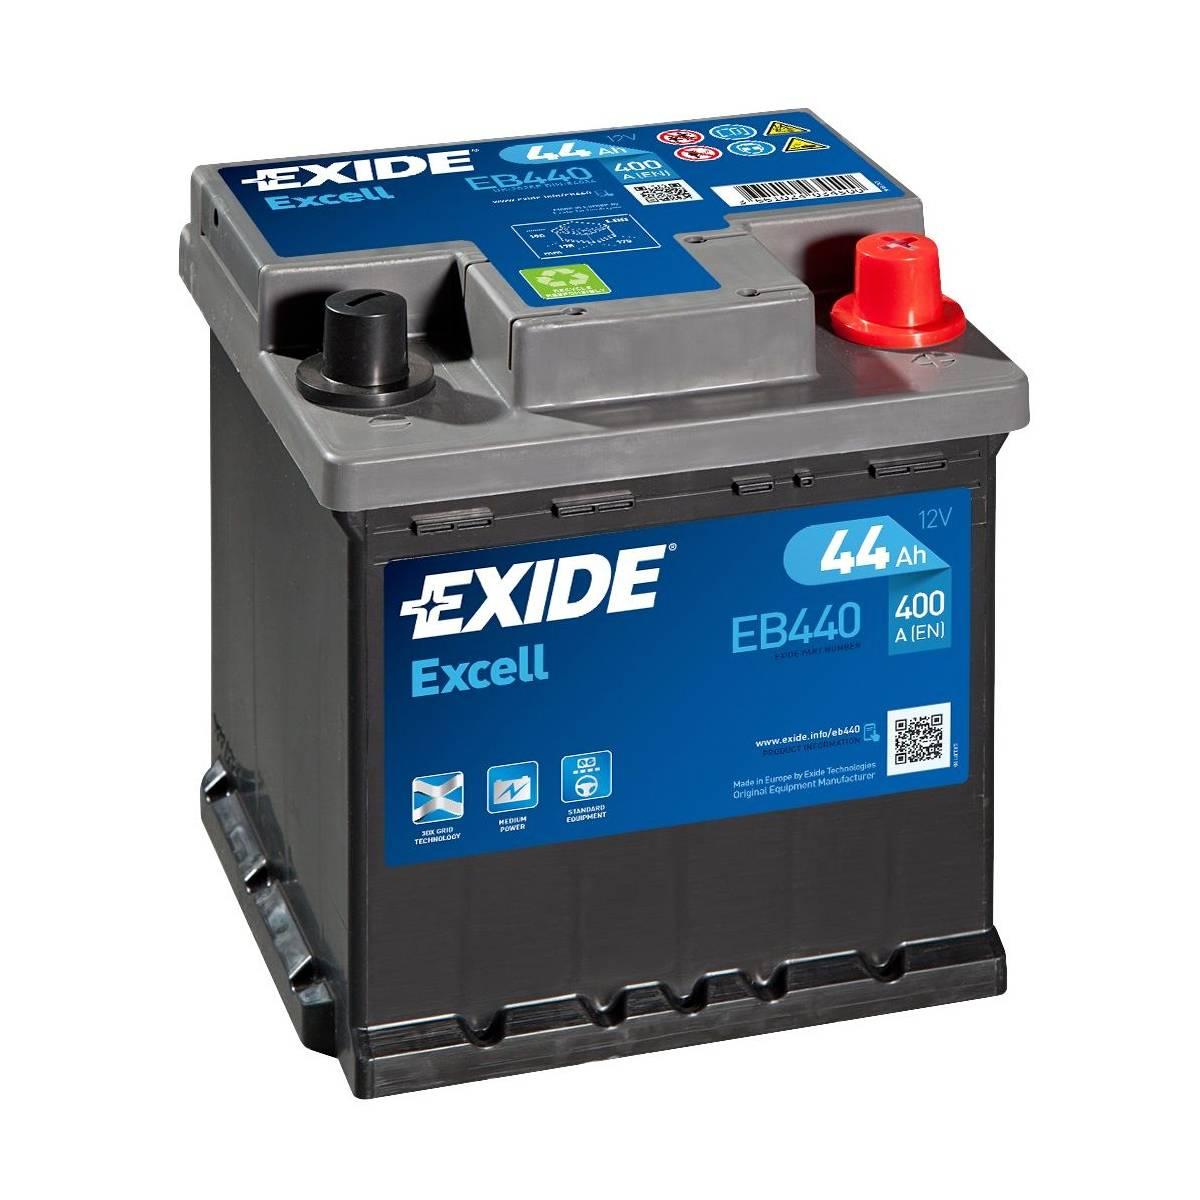 Autobaterie Exide Excell EB440 - 44Ah, 12V